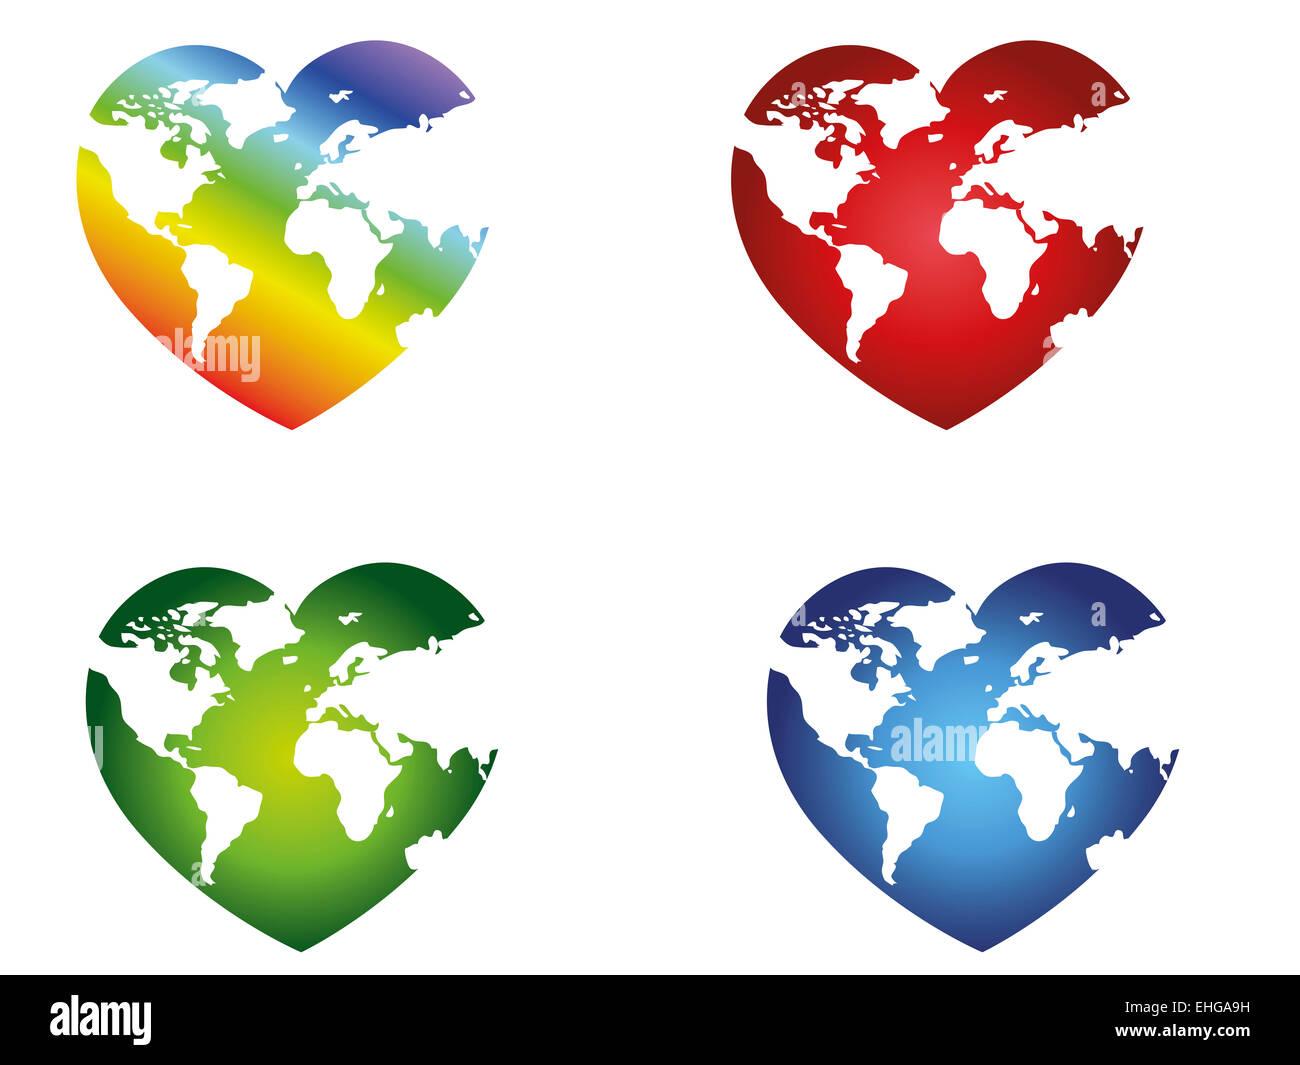 Illustration Of Different World Map Heartshaped Stock Photo - World map shape